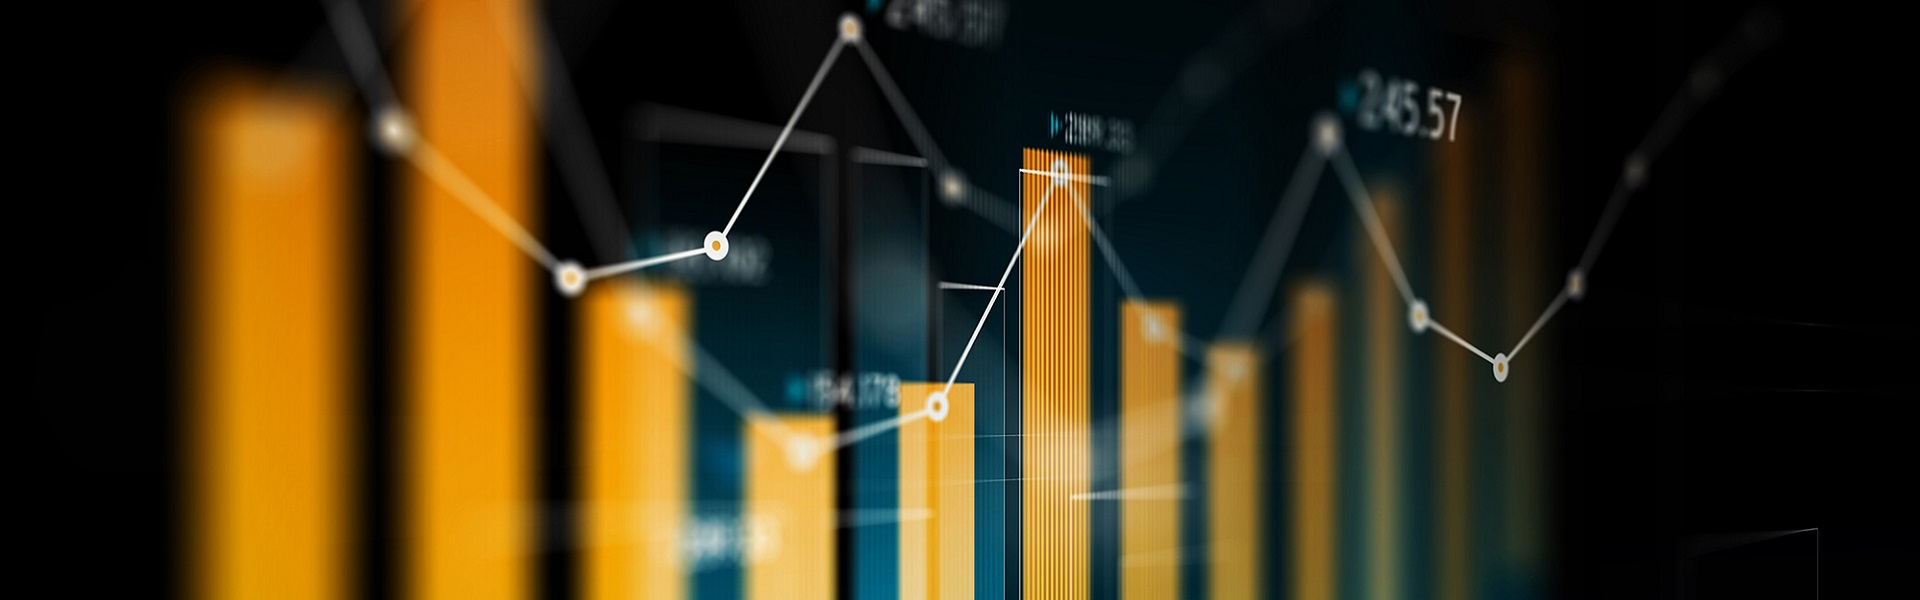 Analytics Practice Kantar Sifo